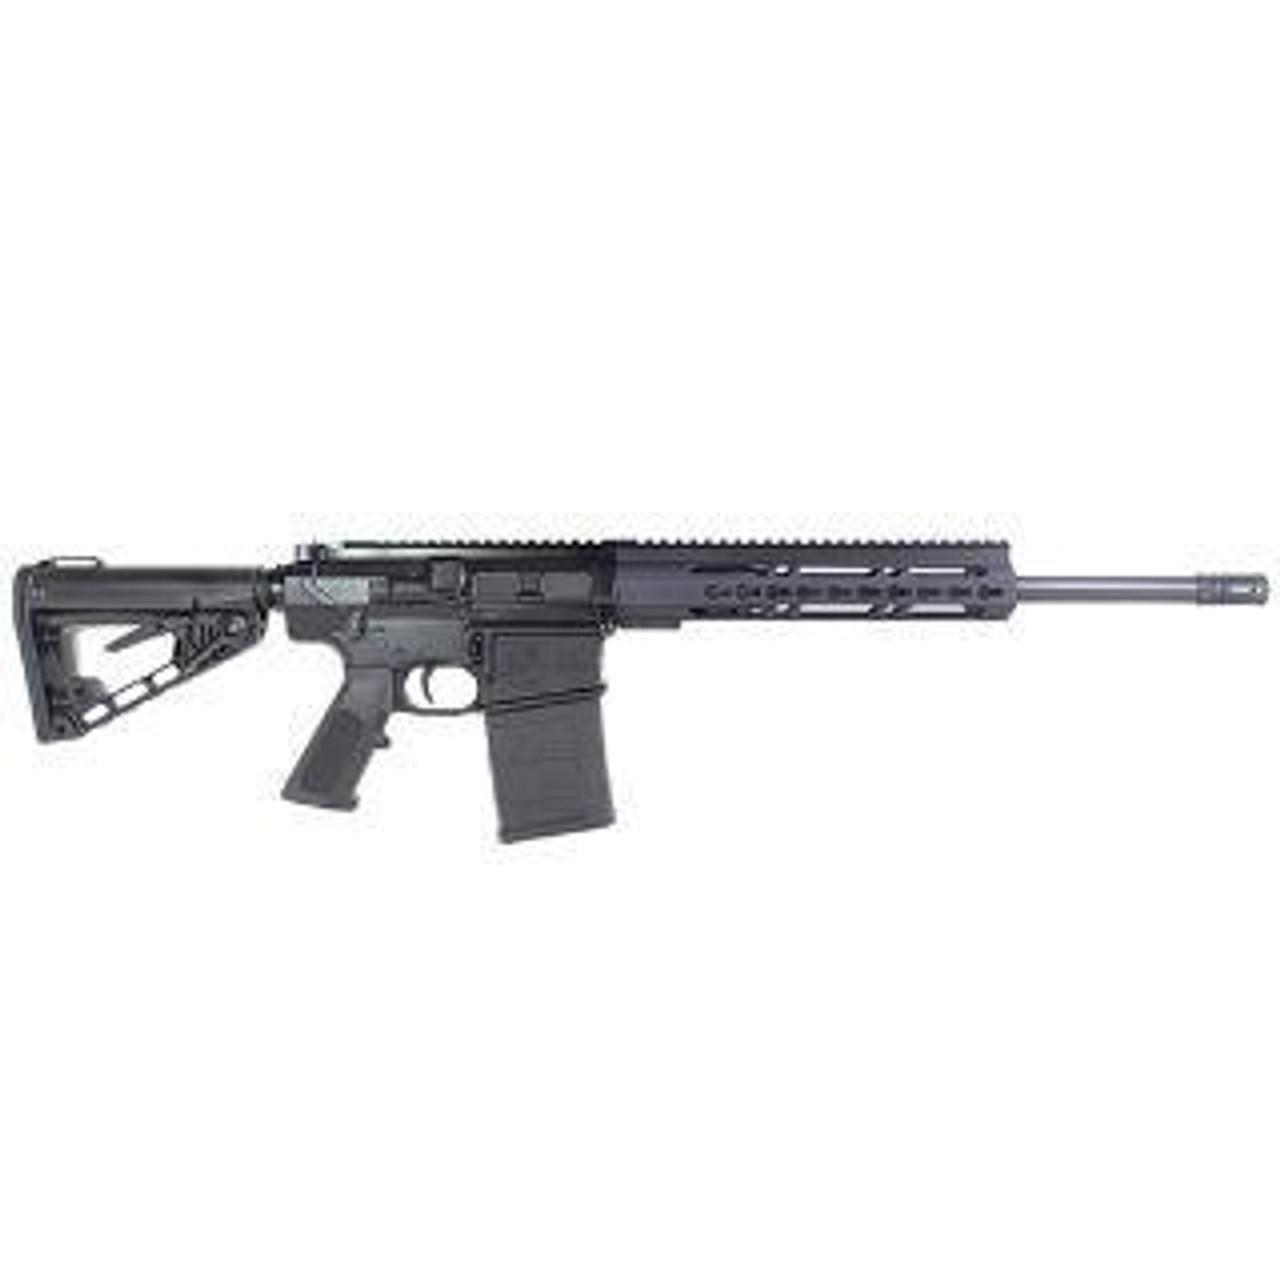 Diamondback Tactical DB10 CKMB CALIFORNIA LEGAL - .308/7.62x51